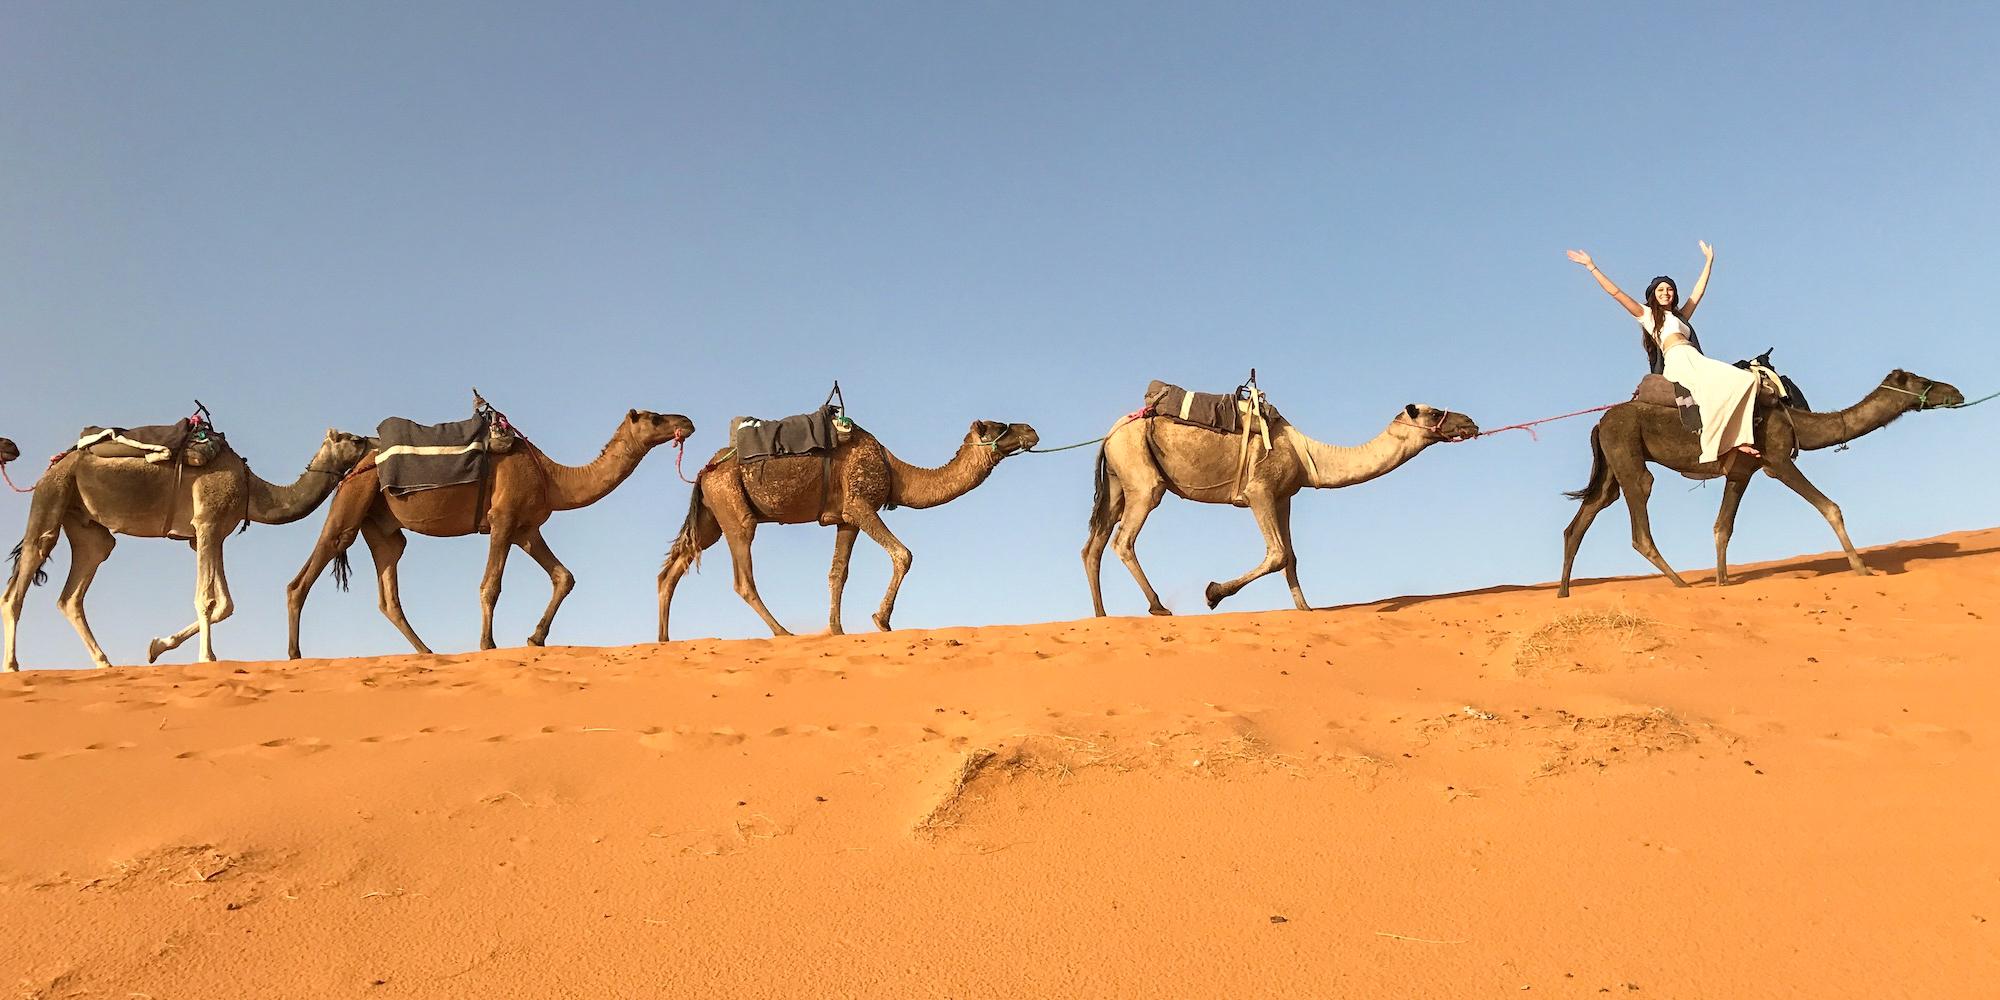 Carina Otero in the Sahara Desert in Merzouga, Morocco